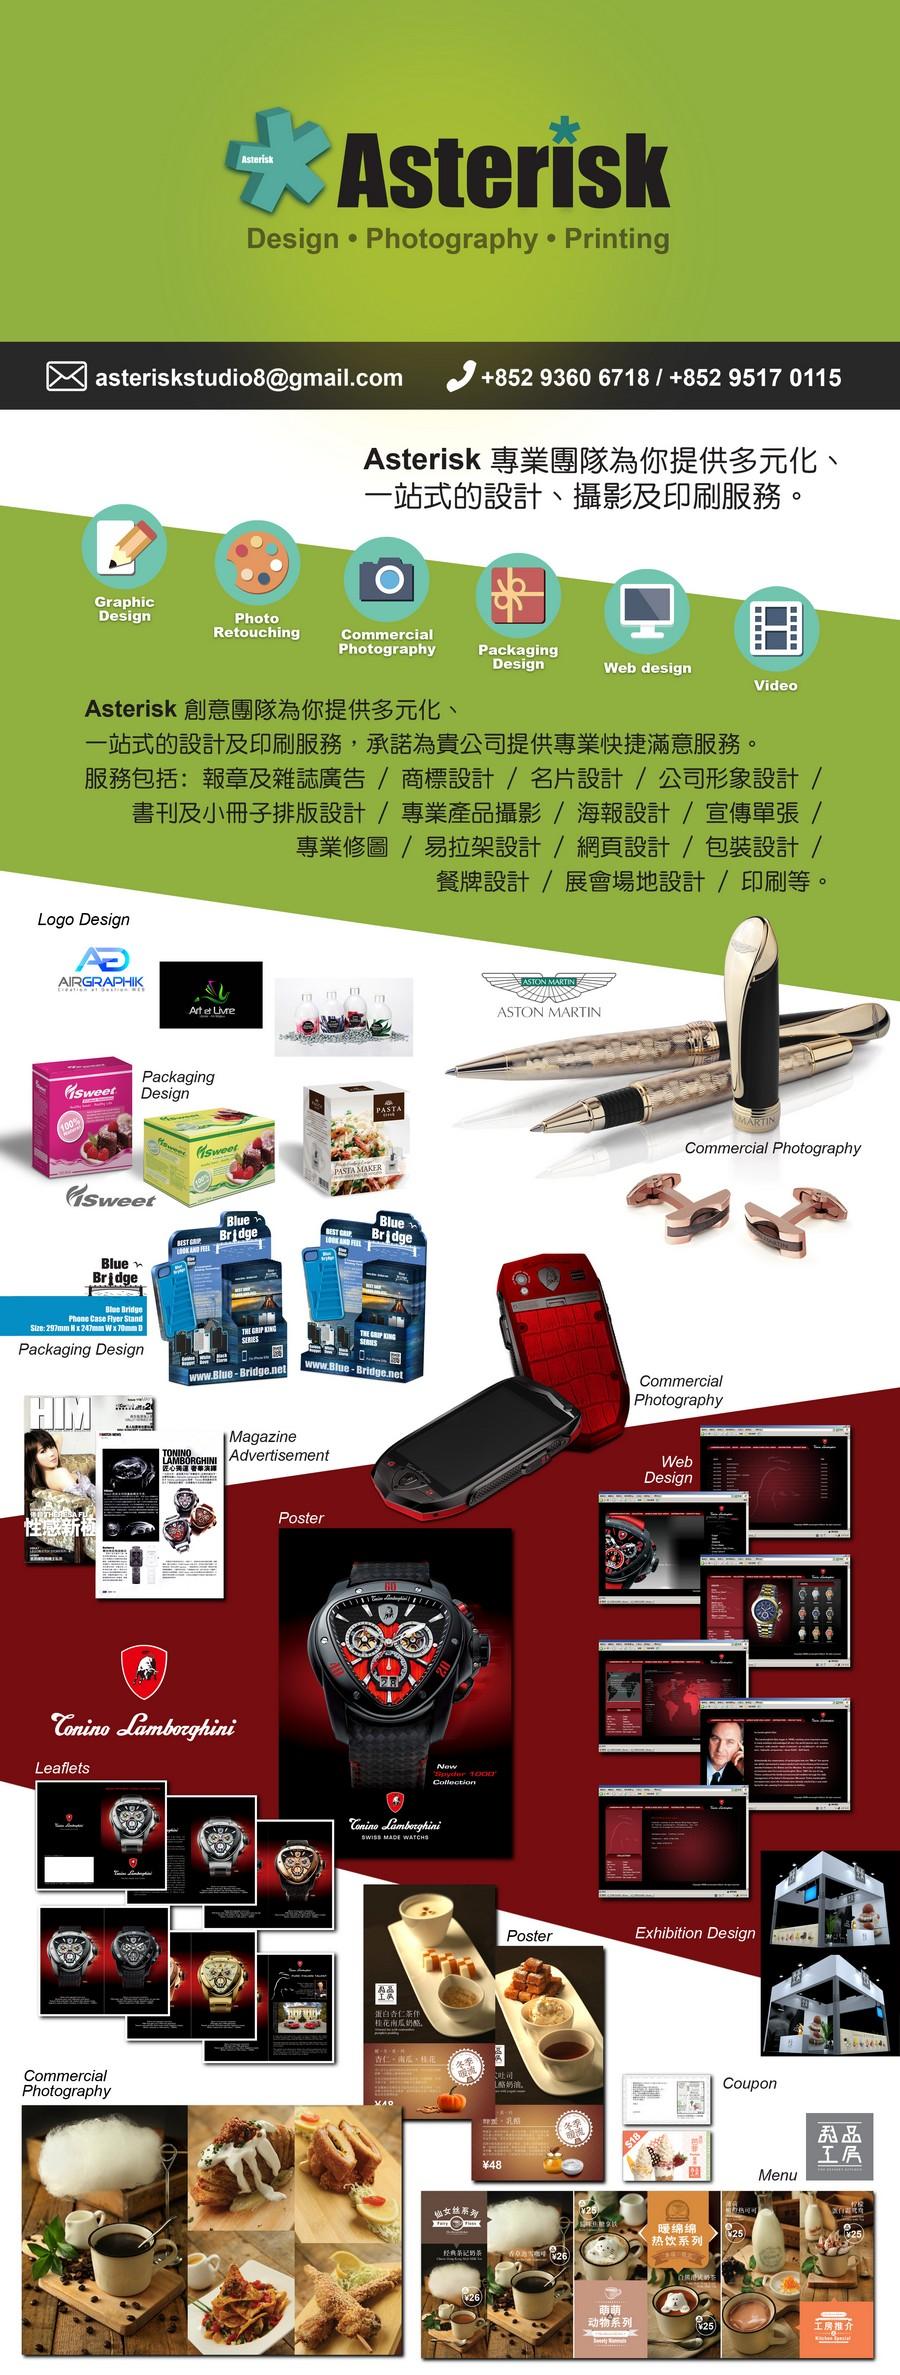 Asterisk Design Photography Printing asteriskstudio8@gmail.com +852 9360 6718/ +852 9517 0115 Asterisk專業團隊為你提供多元化、 一站式的設計、攝影及印刷服務 Graphic Design Photo Retouching Commercial Photography Packaging Design Web design Video Asterisk創意團隊為你提供多元化 站式的設計及印刷服務,承諾為貴公司提供專業快捷滿意服務 服務包括:報章及雜誌廣告/商標設計/名片設計/公司形象設計/ 書刊及小冊子排版設計/專業産品攝影/海報設計/宣傳單張/ 專業修圖/易拉架設計/網頁設計/包裝設計/ 餐牌設計/展會場地設計/印刷等 Logo Design AIRGRAPHK OT Art et Lure ASTON MARTIN Packaging Design Commercial Photography Sweet Br Blue Bridge Phane Cae Flyer Stand Packaging Design www.Blue-Bridge.net www.Blue Photography Magazine Advertisement Web Design Poster Leaflets Poster Exhibition Design 蛋r1杏仁茶仔 桂花南瓜奶M. Commercial El coupon し鮥奶流 tr㎡ ,乳酪 贔品 #48 Menu 暖绵绵 热饮系列 动物系列,product,advertising,product,web page,website